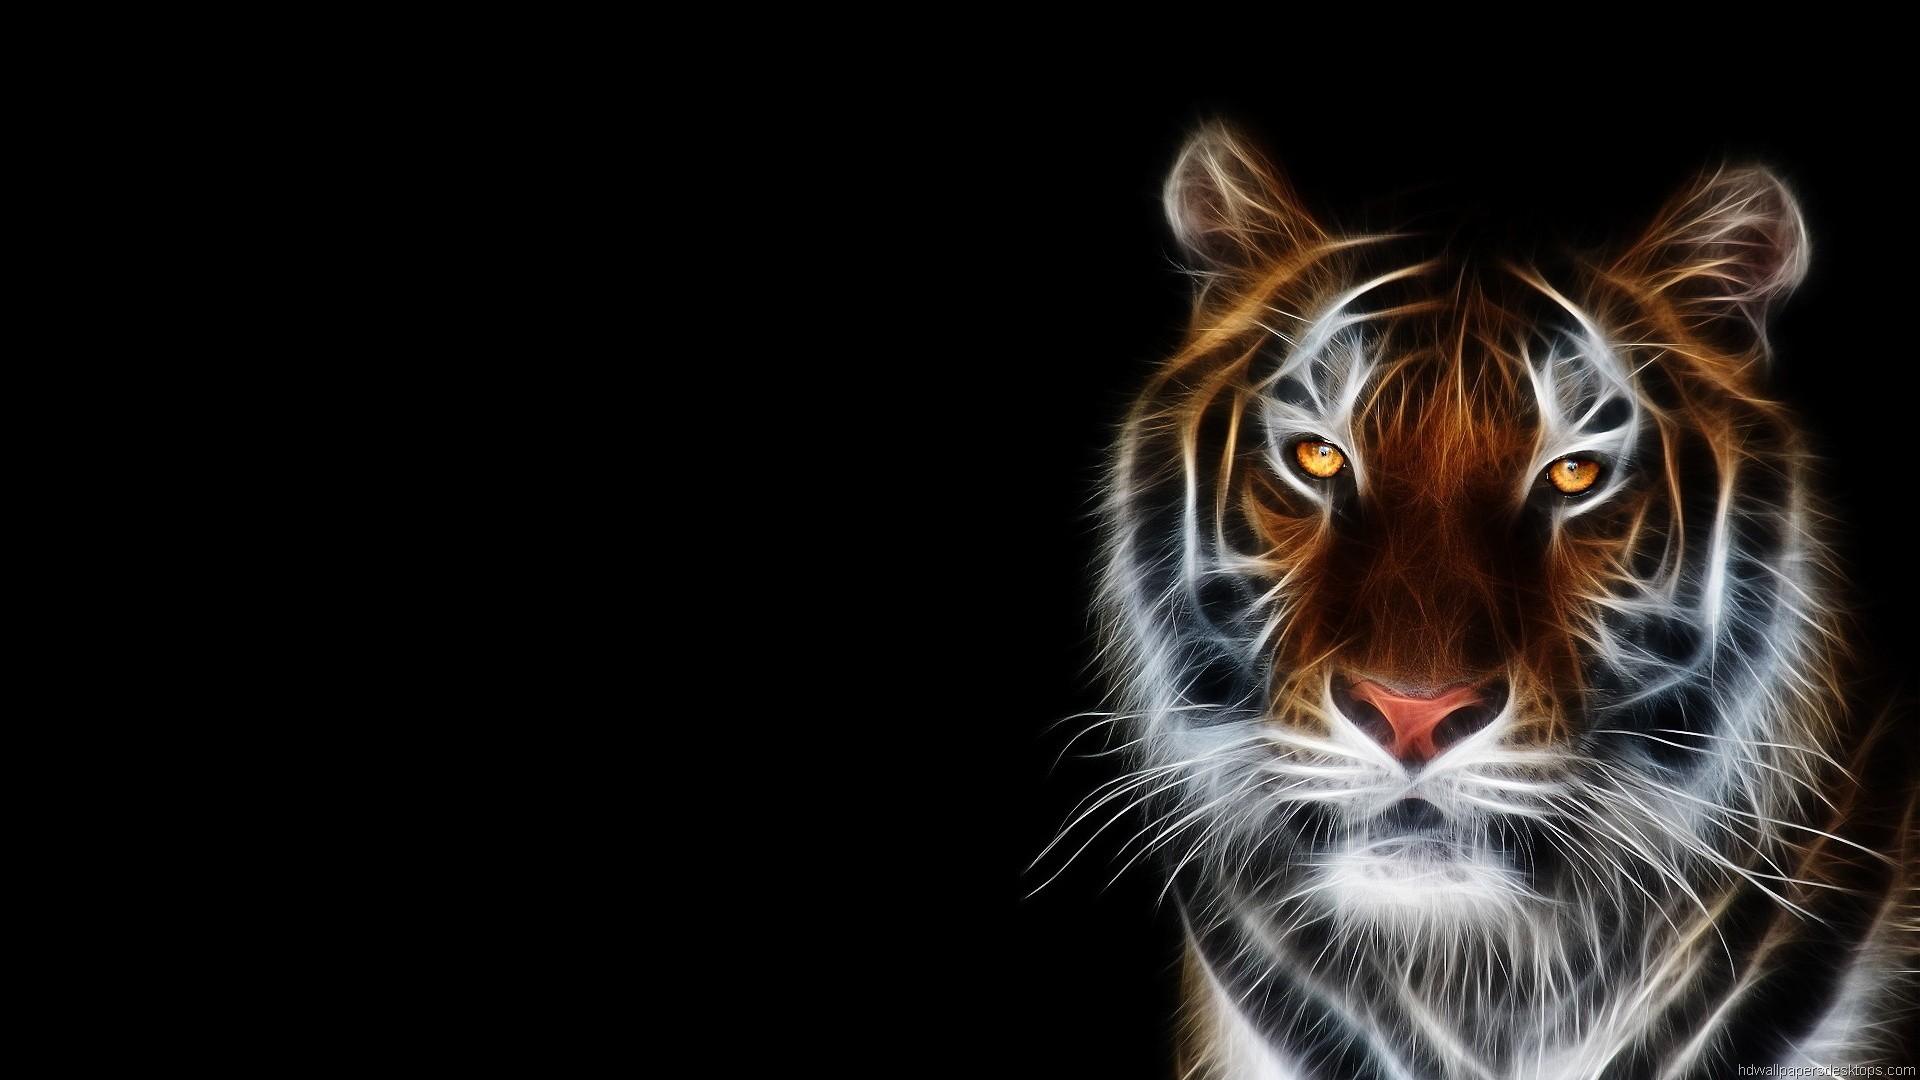 Hd Animal Wallpapers Wild Life Animal Desktop Images: HD Animal Wallpaper 1920x1080 (73+ Images